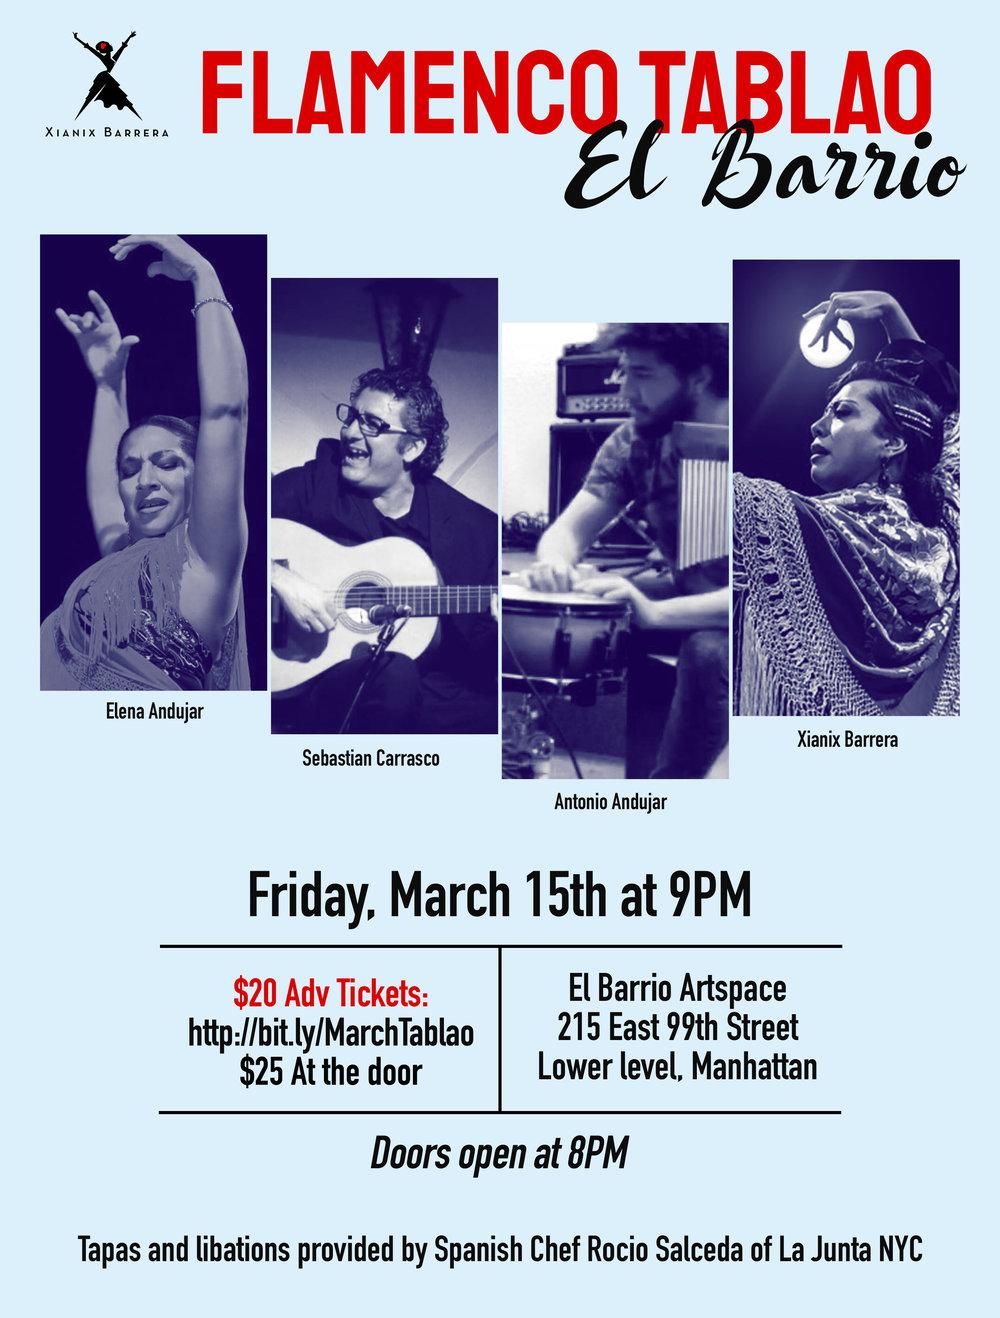 Fri. March 15th - 9pmMONTHLY FLAMENCO TABLAO SHOW - FLAMENCO TABLAO EL BARRIOFeaturing Guest Artists Elena Andujar, Antonio Andujar,Sebastian Carrasco and and Xianix Barrera.